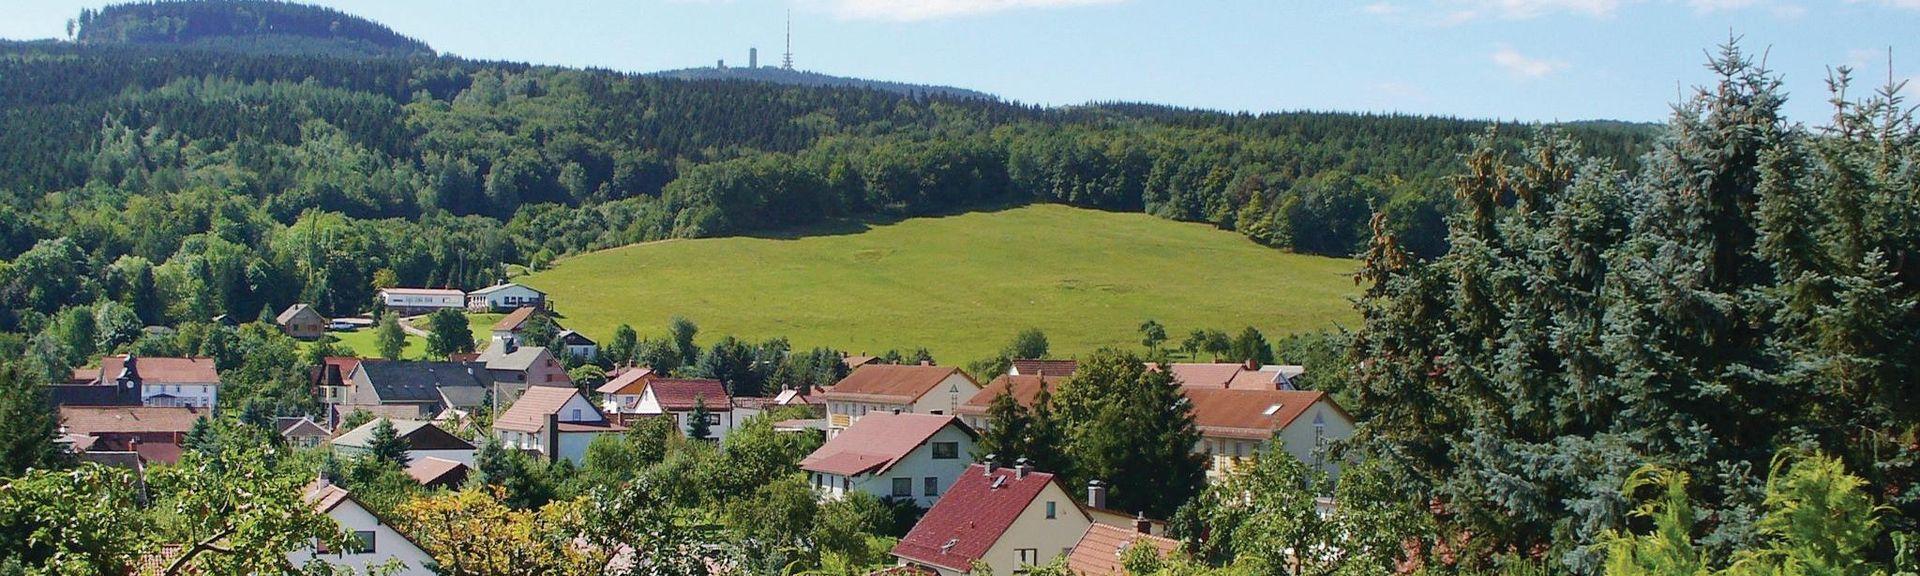 Eisenach, Turíngia, Alemanha